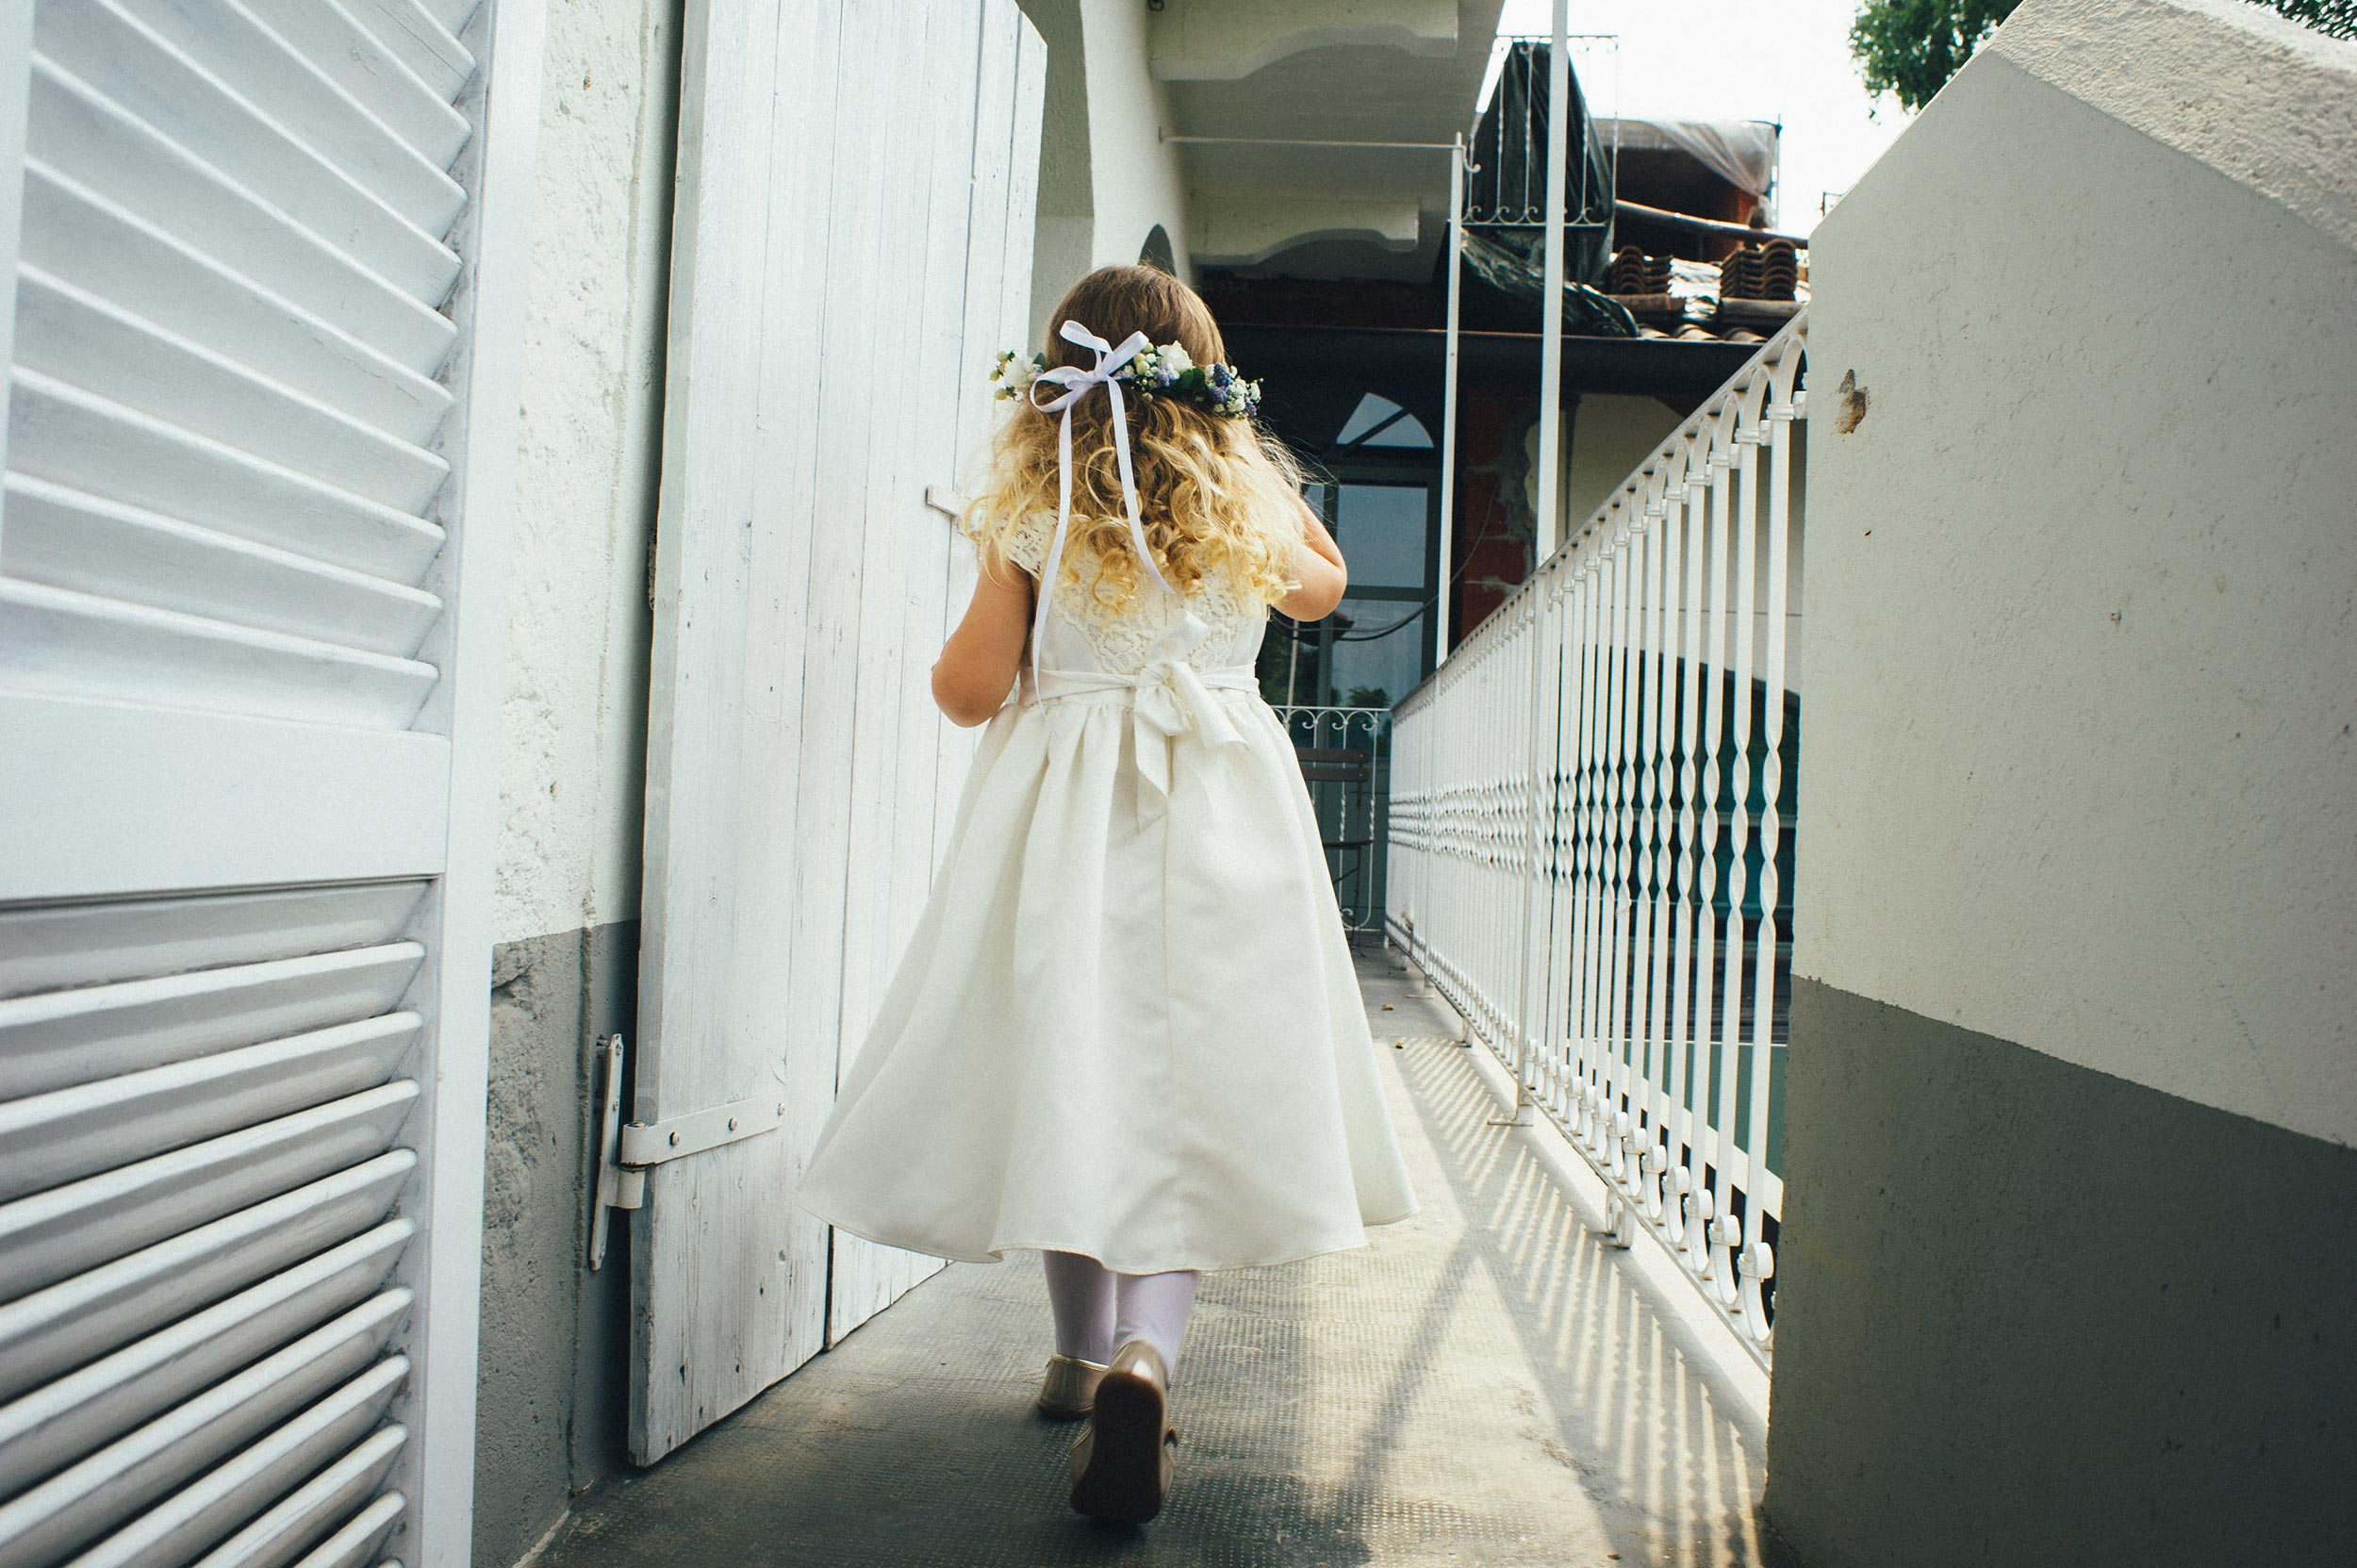 2016-Julius-Silke-Lake-Orta-Wedding-Photographer-Italy-Alessandro-Avenali-12.jpg